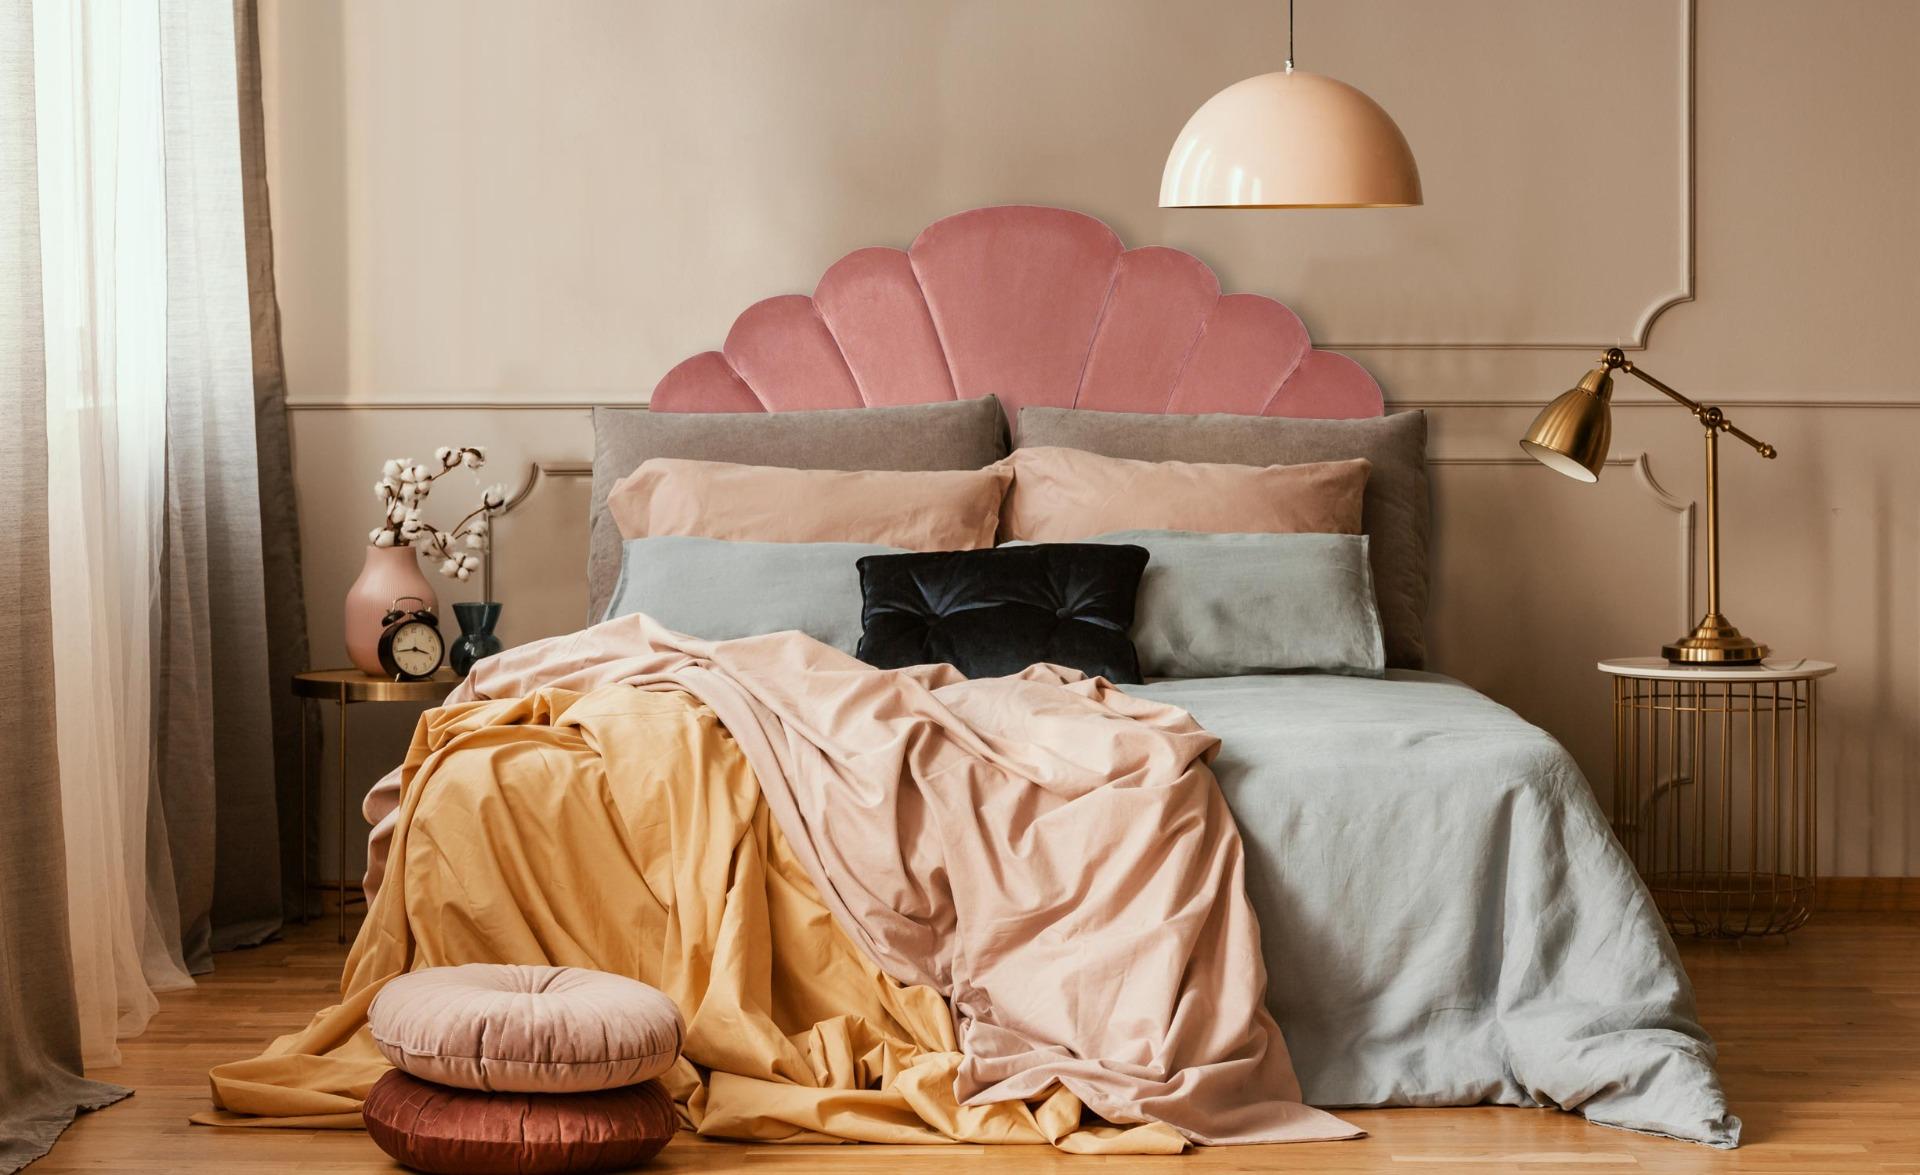 Tête de lit Mermaid 140 cm Velours Rose